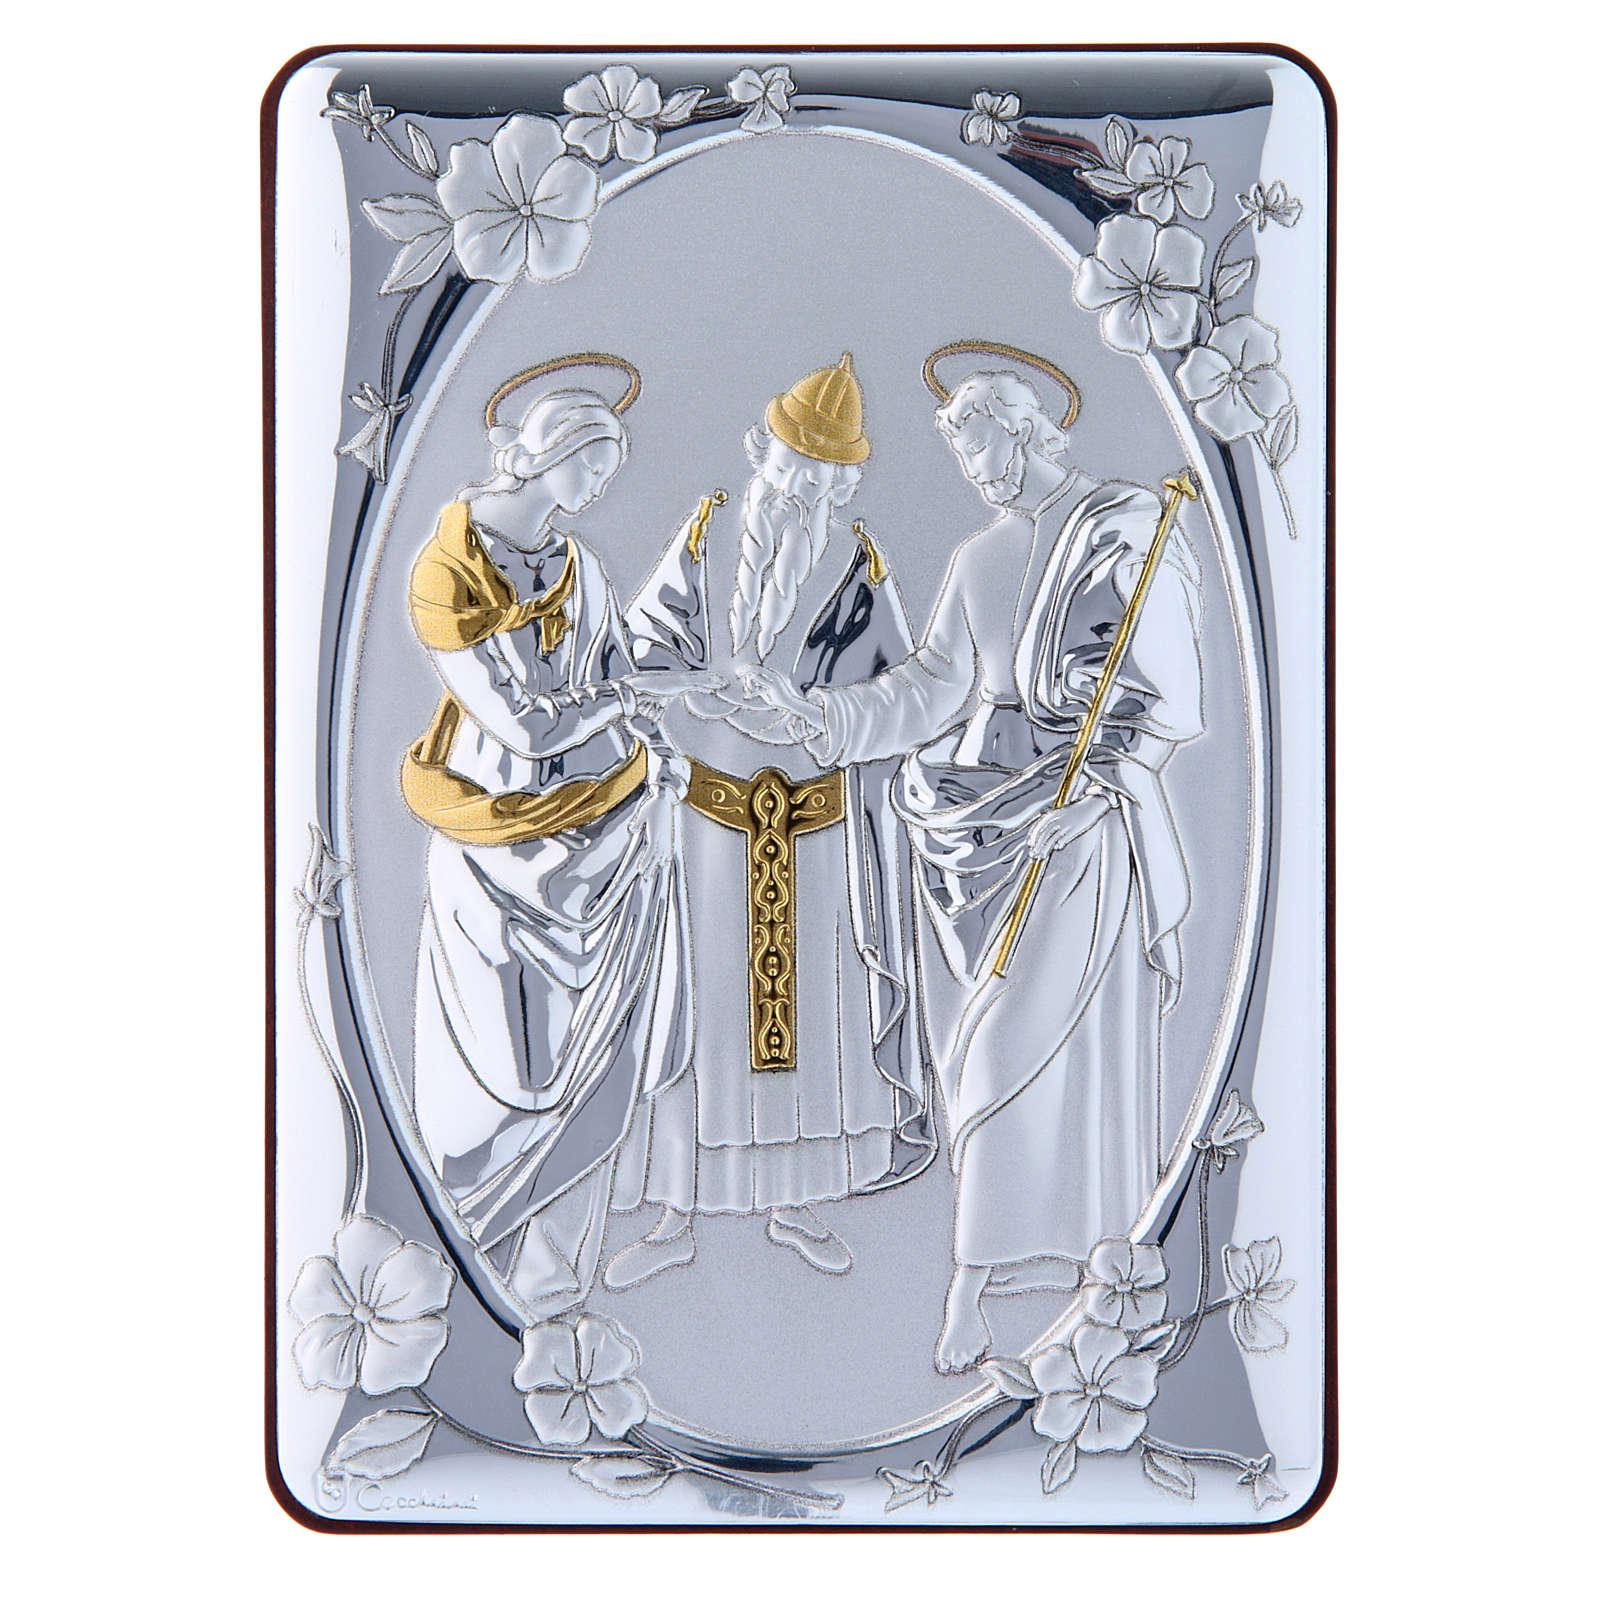 Quadro Matrimonio Vergine bilaminato retro legno pregiato rifiniture oro 14X10 cm 4